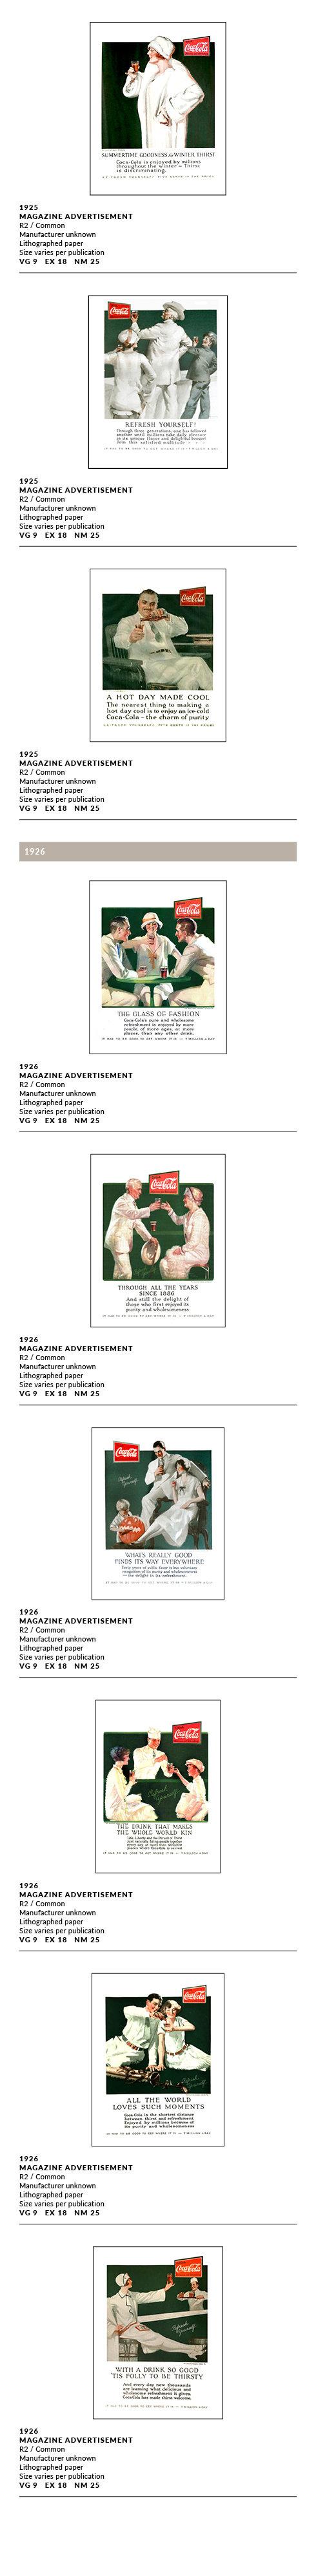 1925-29 Ads_2.jpg